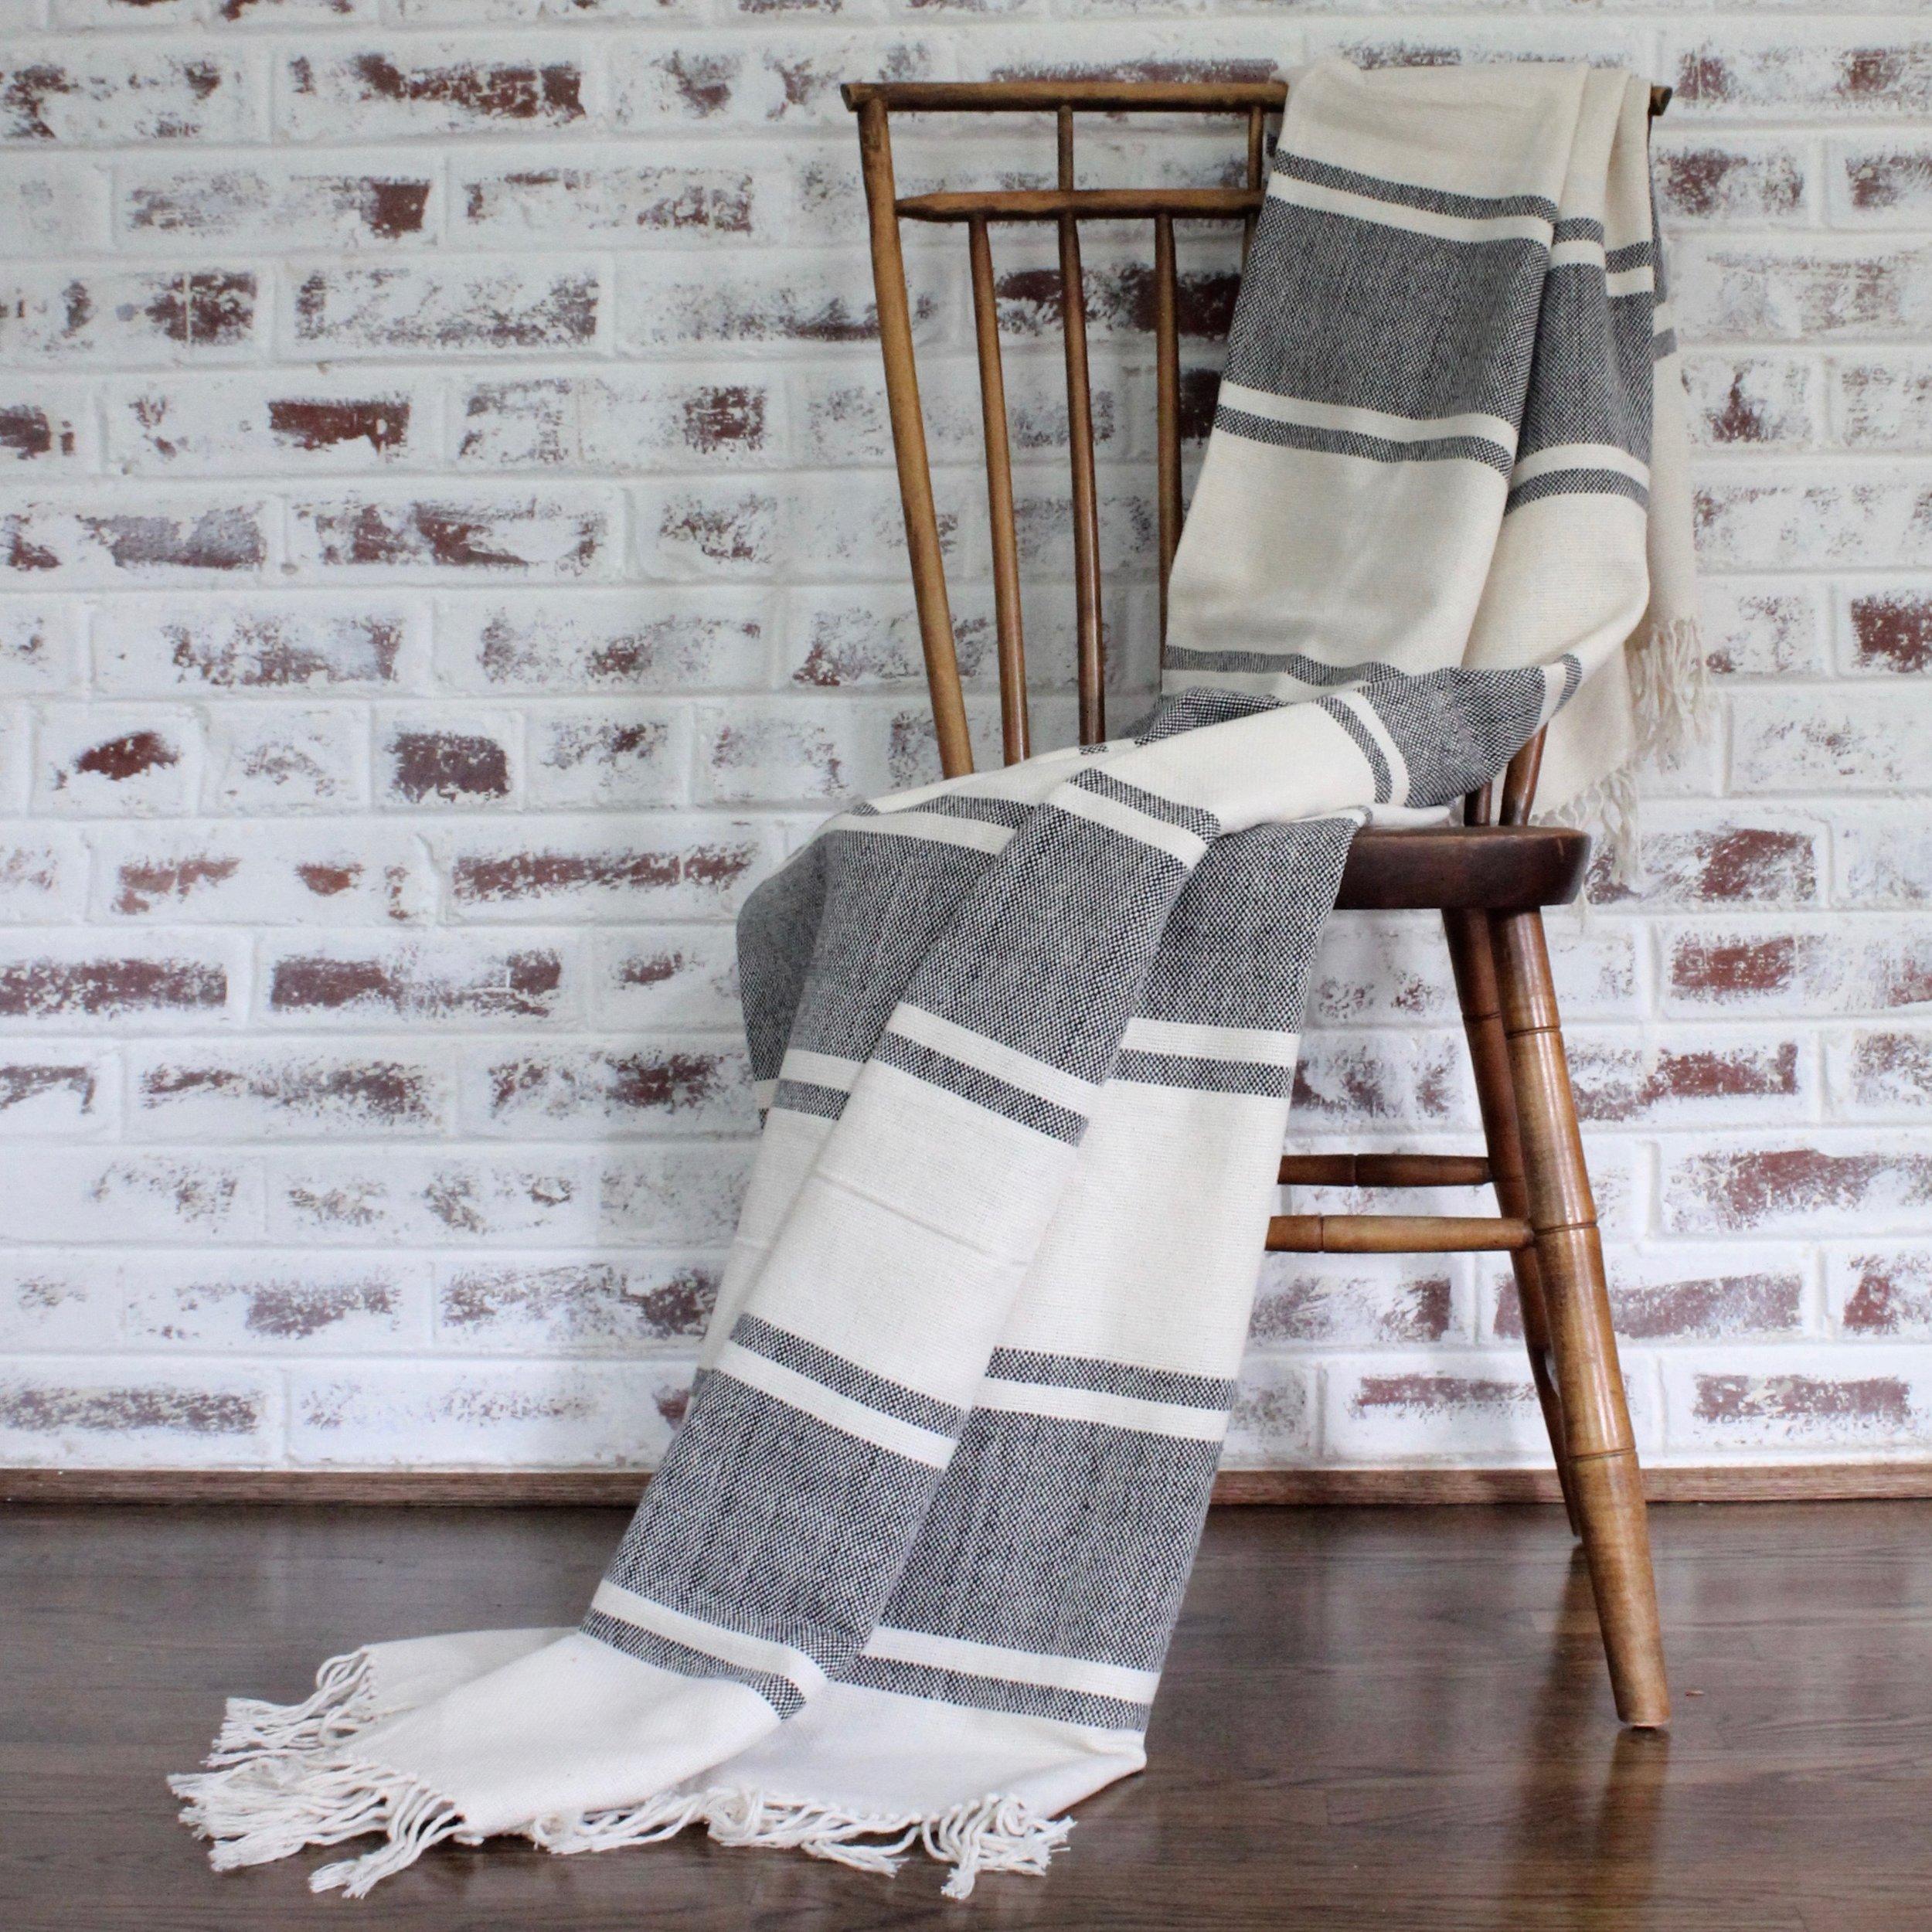 AUDAZ Blanket